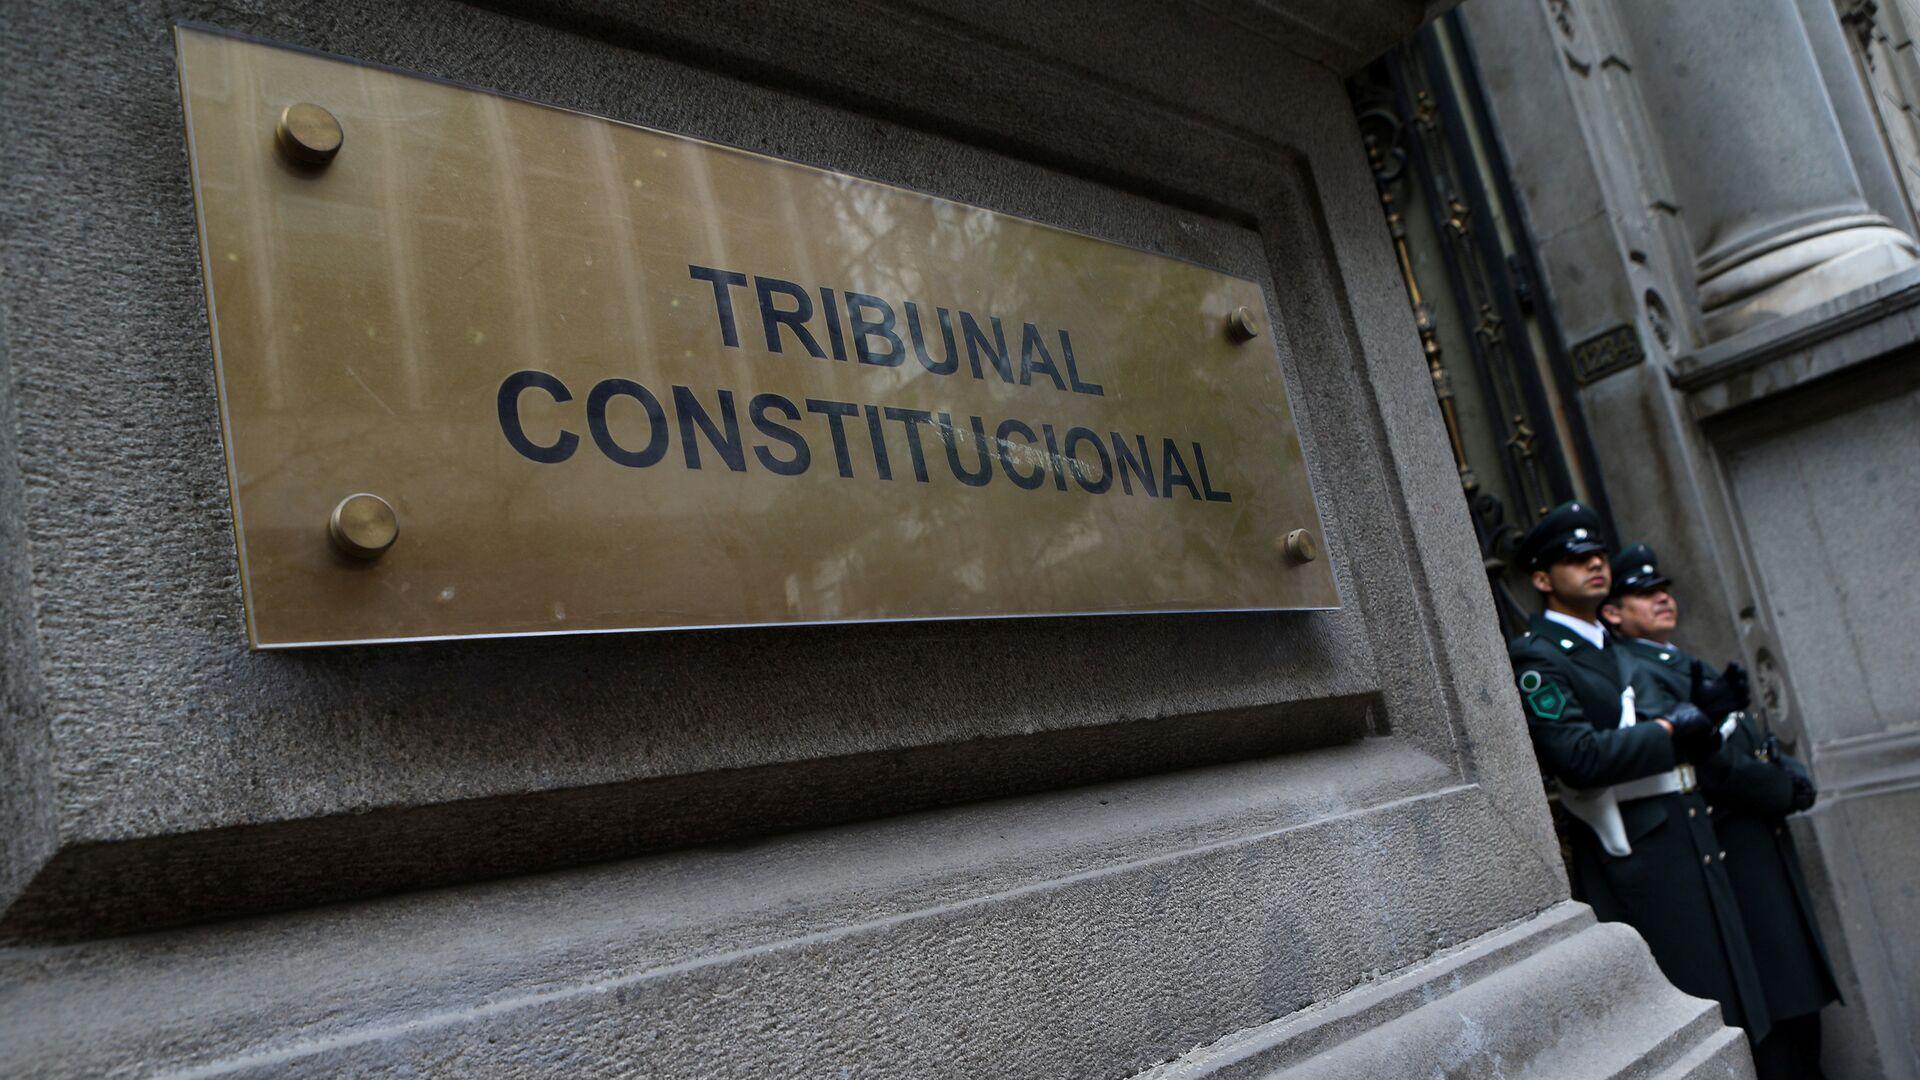 Tribunal Constitucional de Chile - Sputnik Mundo, 1920, 27.04.2021